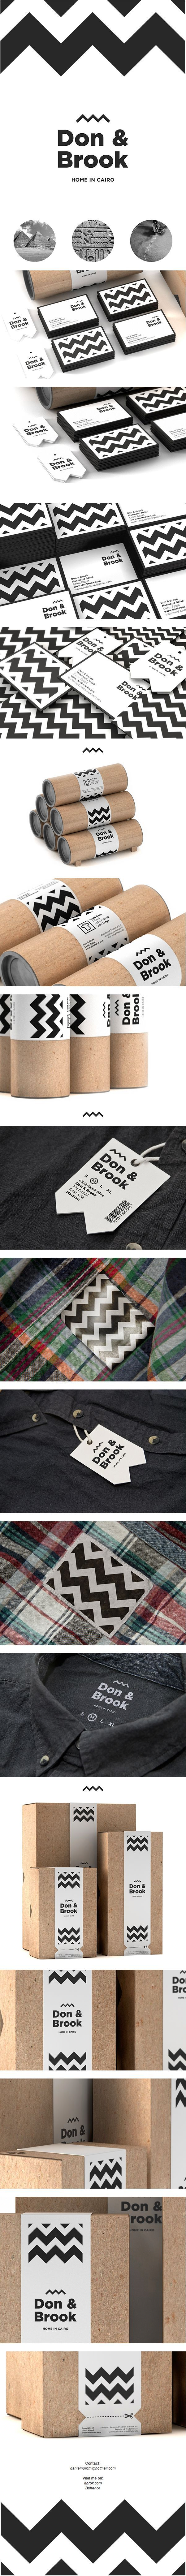 Don & Brook #identity #branding #corporate #design